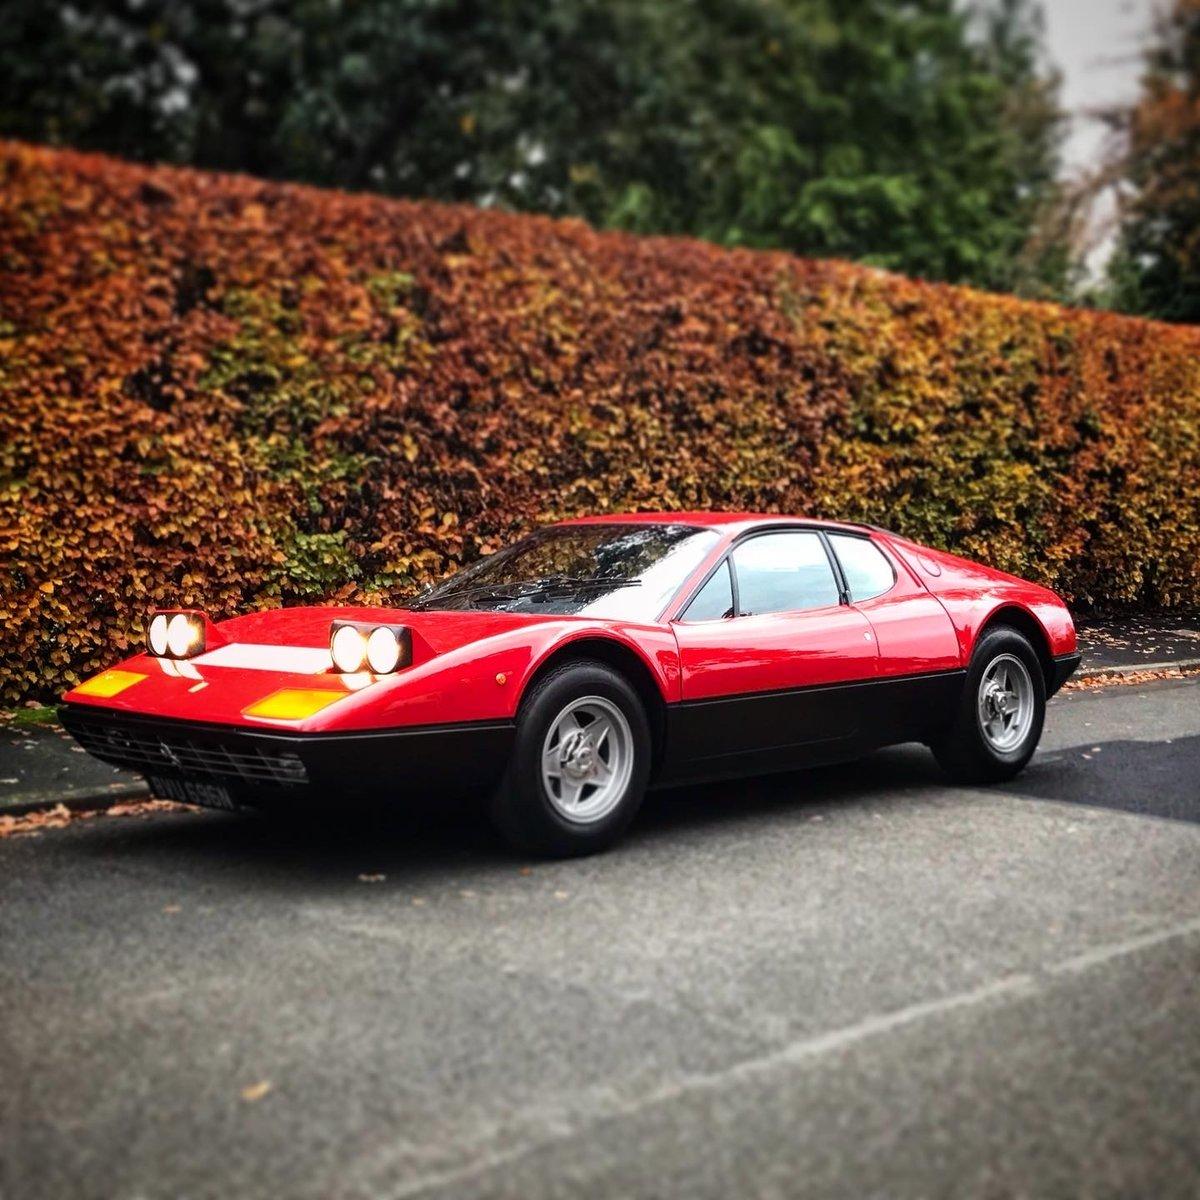 1974 Ferrari 365 Gt4 BB Investment (pre 512 BB) For Sale